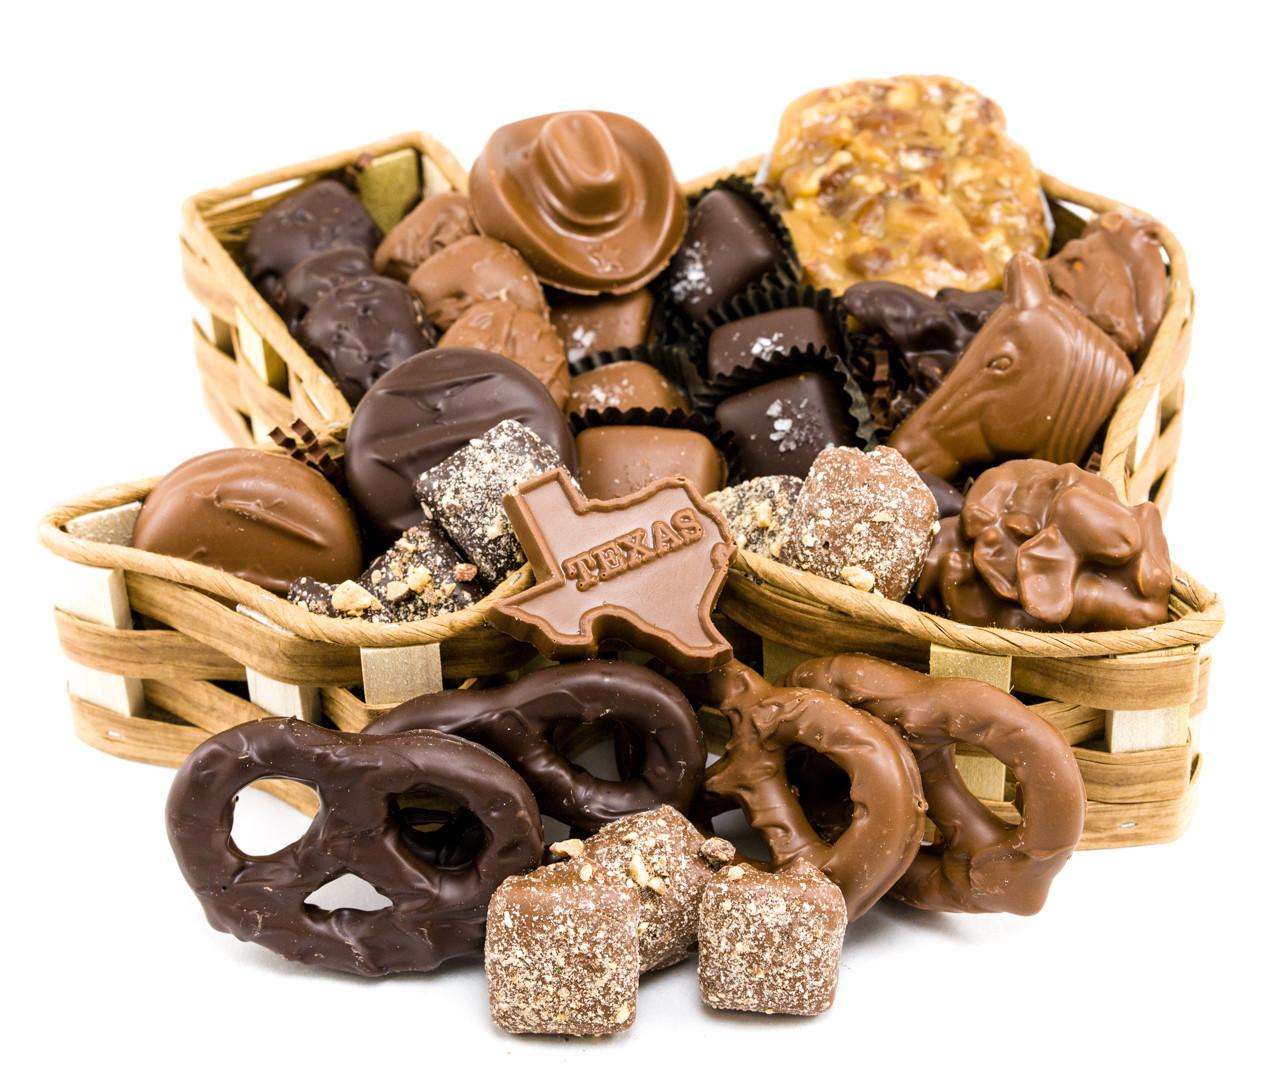 Texas Chocolate Basket - Goodies Texas